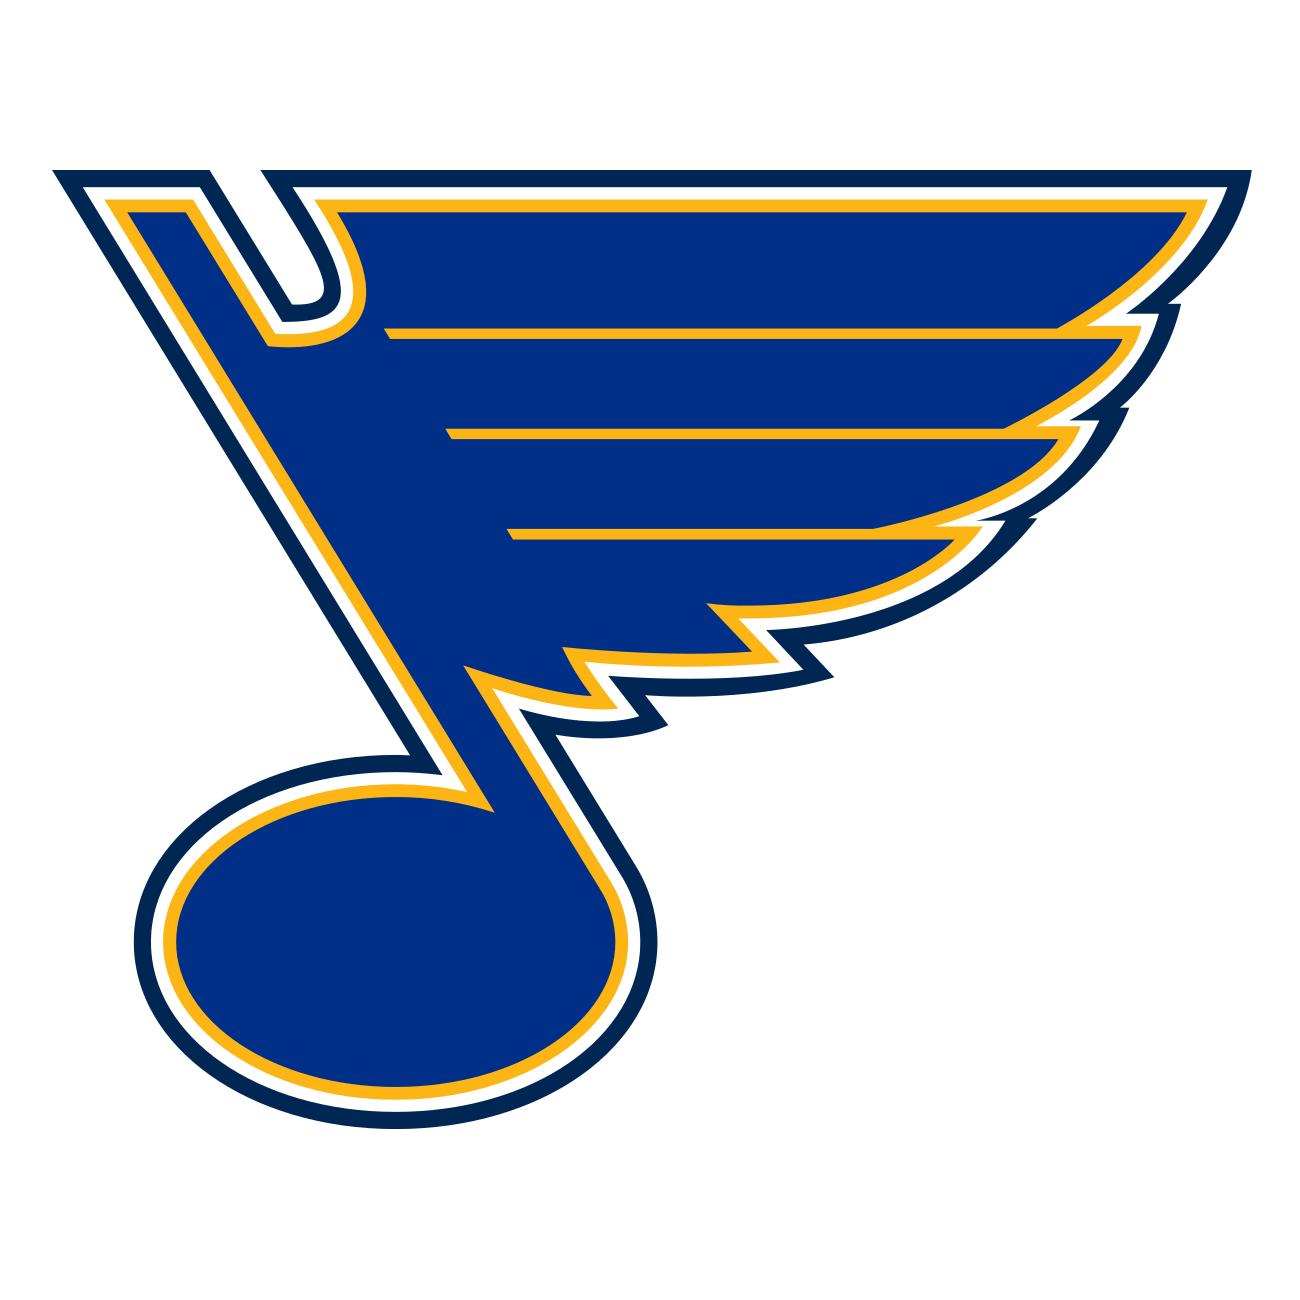 St. Louis Blues team logo